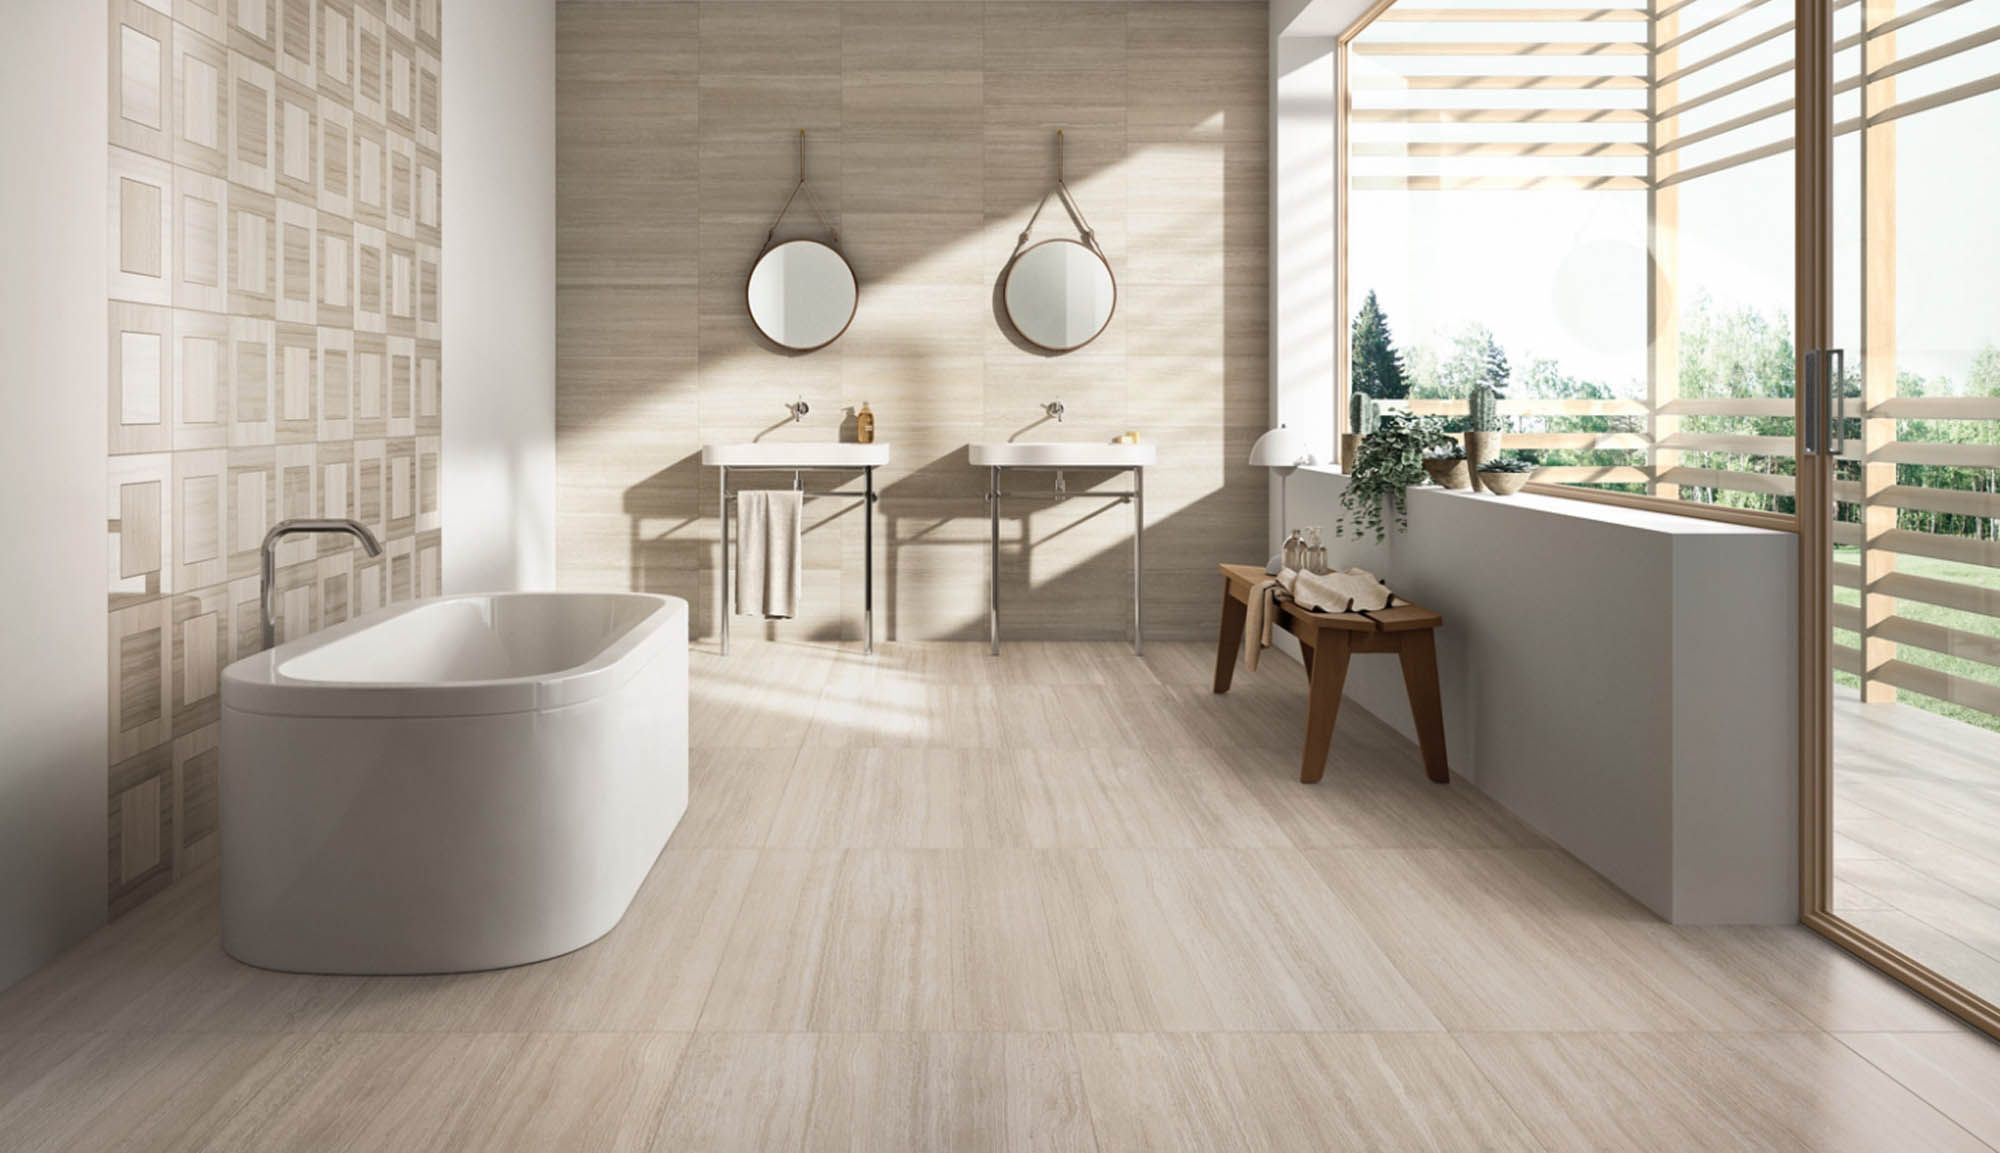 large format tile DOLCE VITA Floors & Tiles Orlando